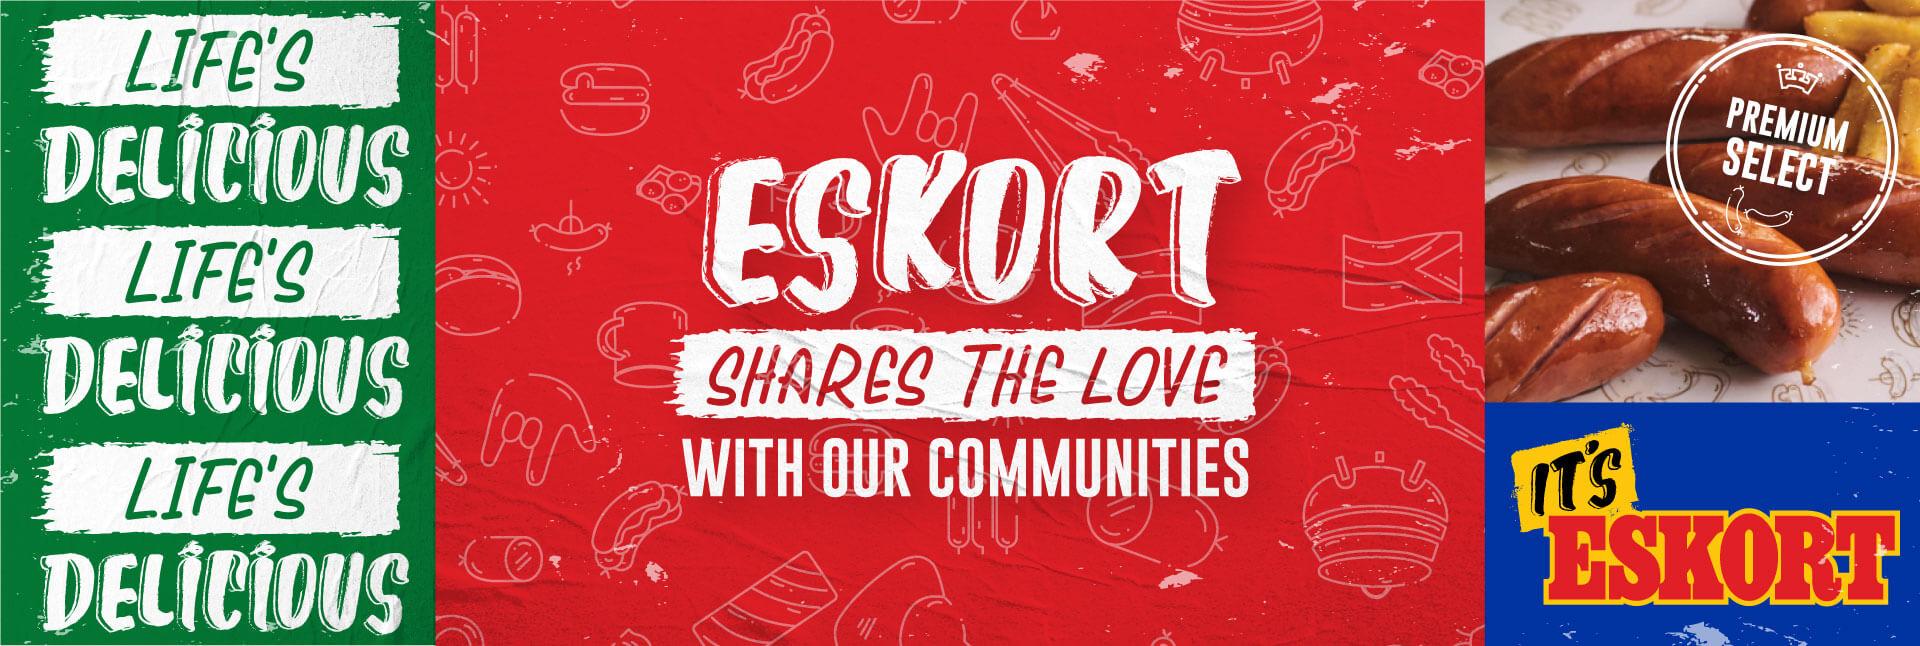 Eskort Home Banner 03